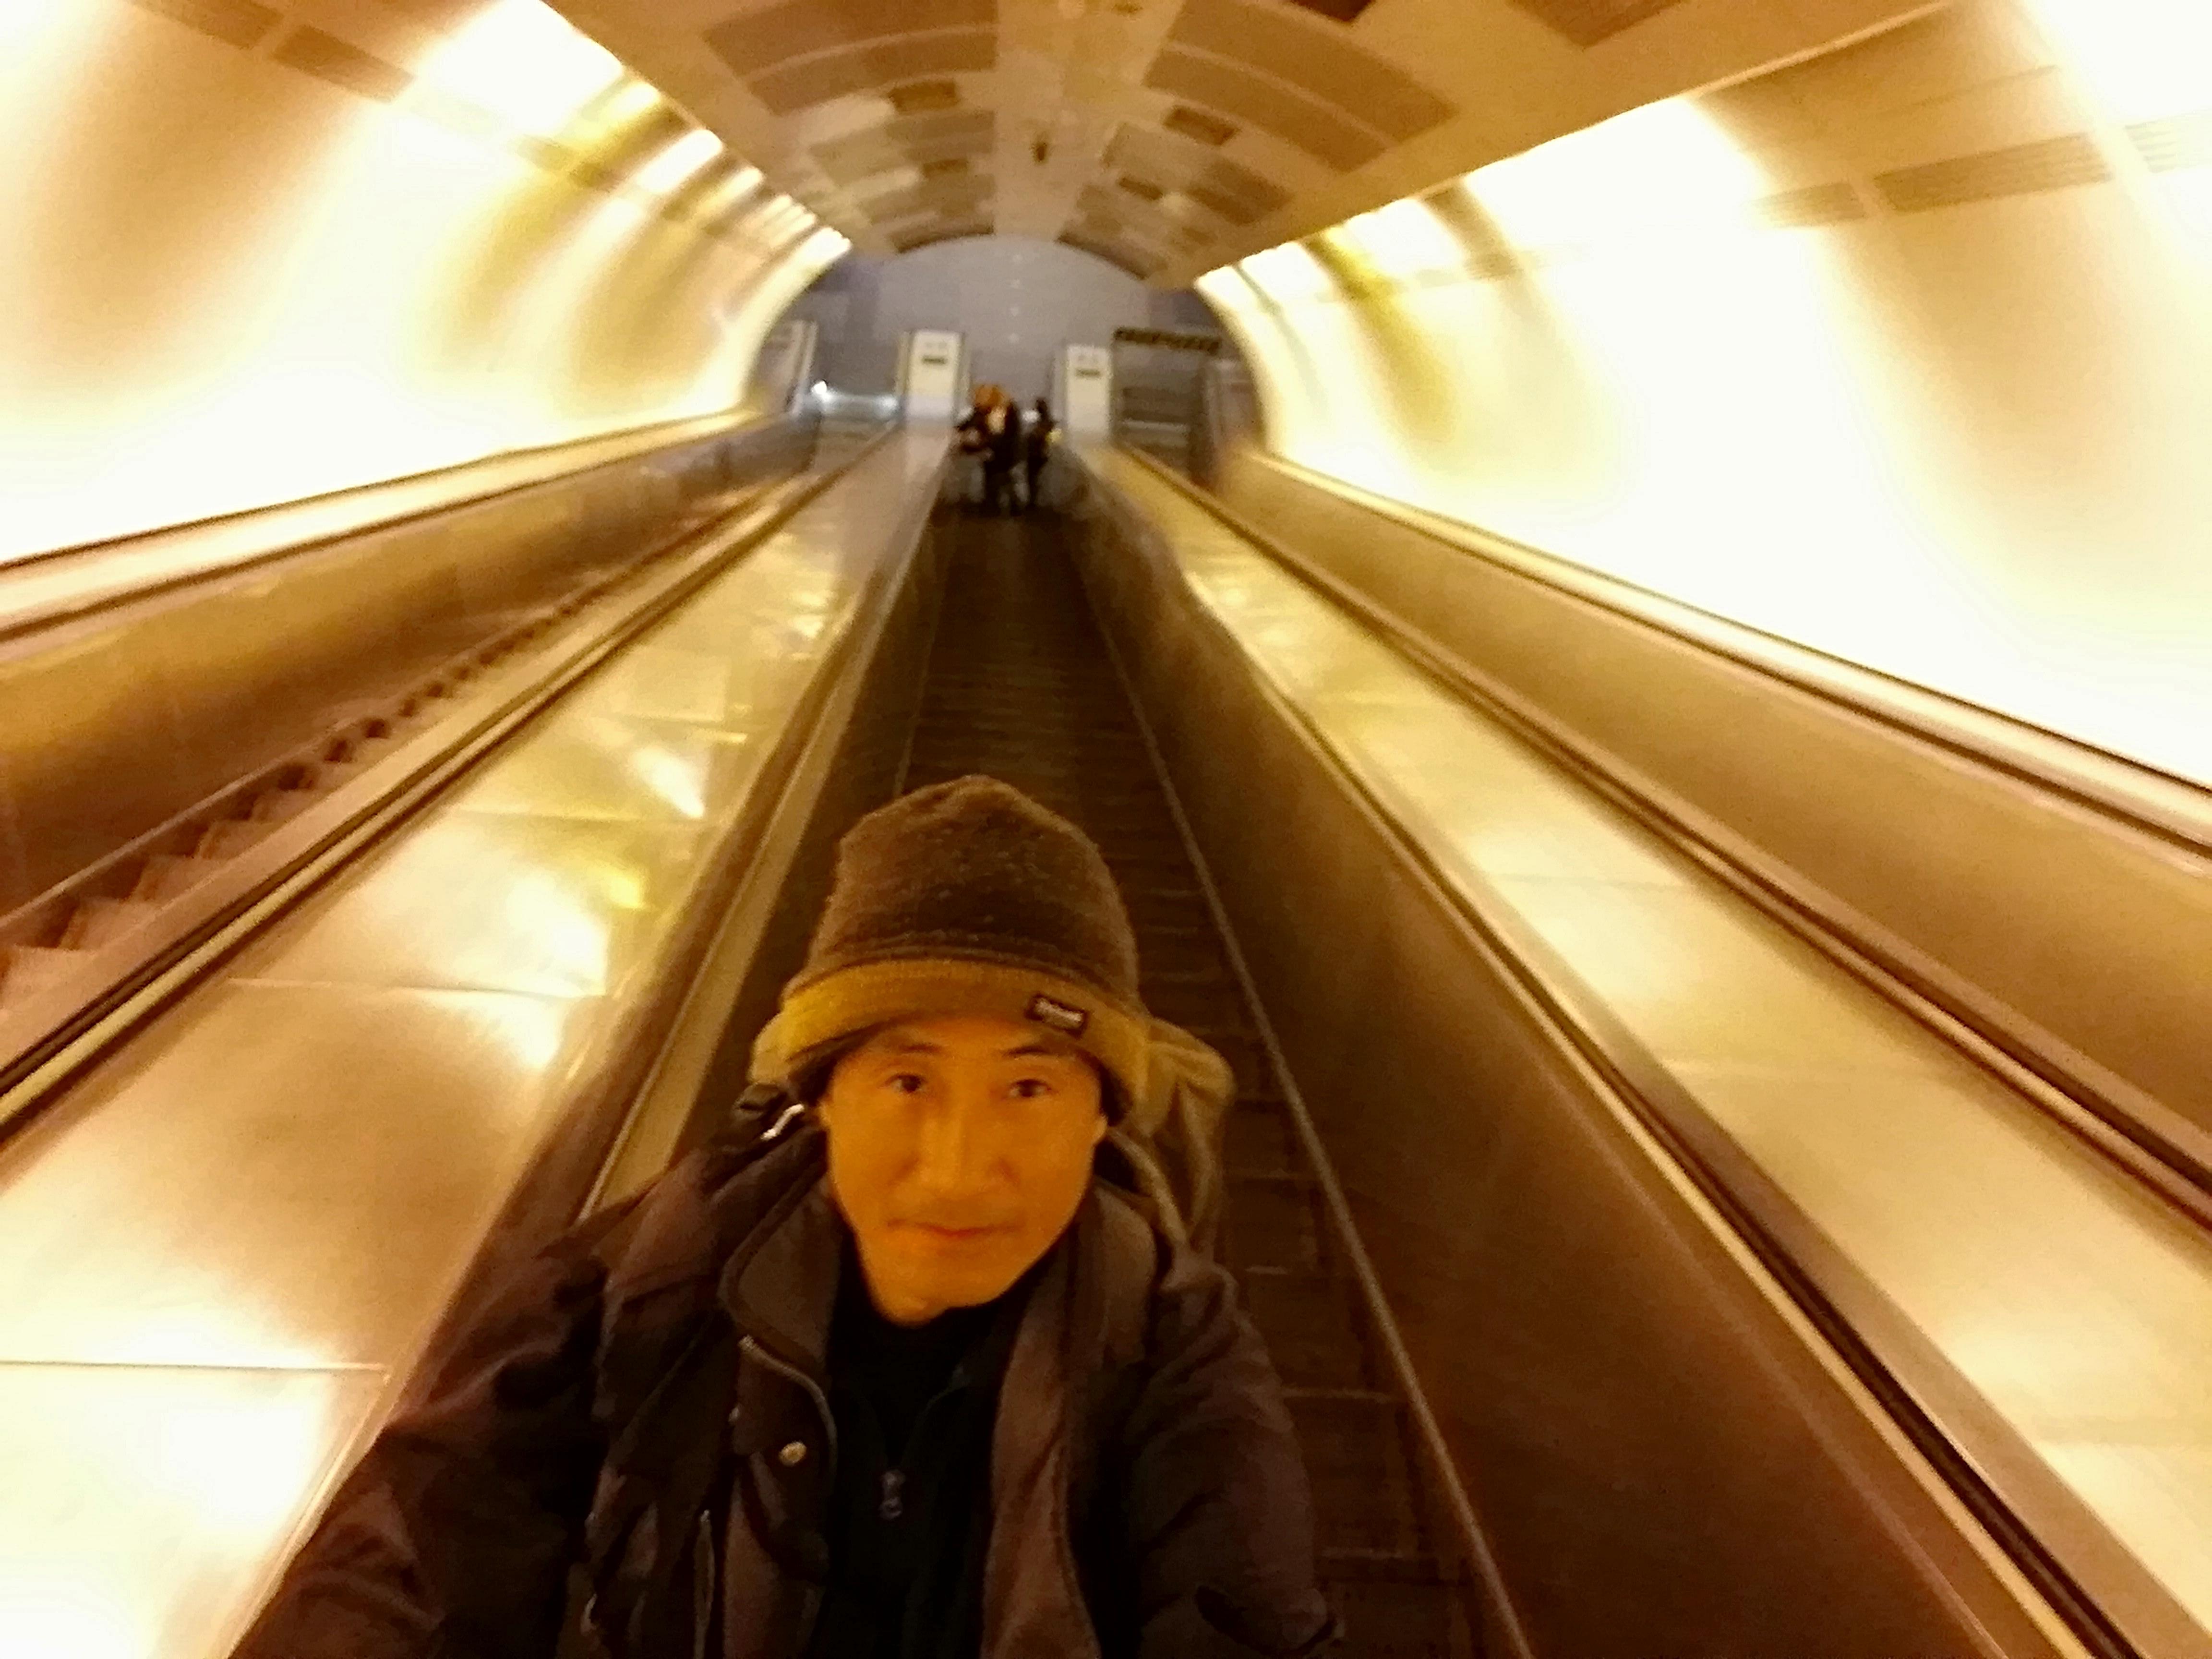 vukov spomenik podzemna stanica